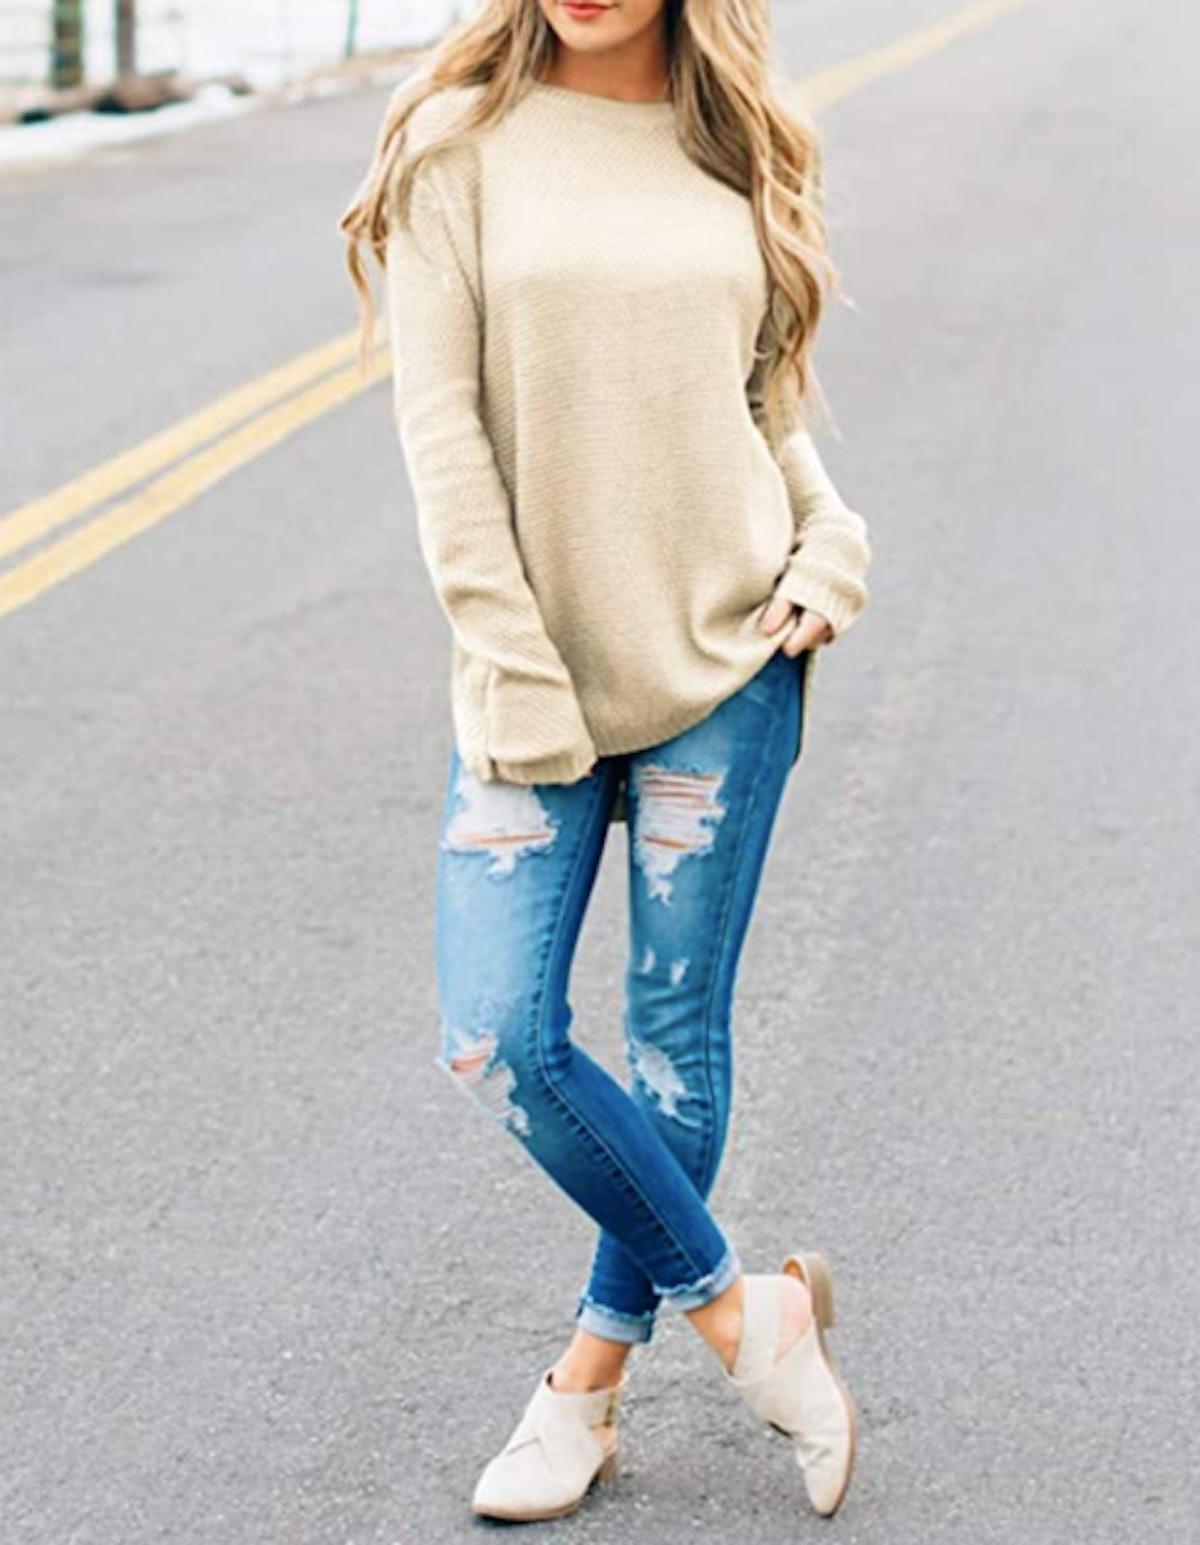 MEROKEETY Long Sleeve Crew Neck Pullover Sweater